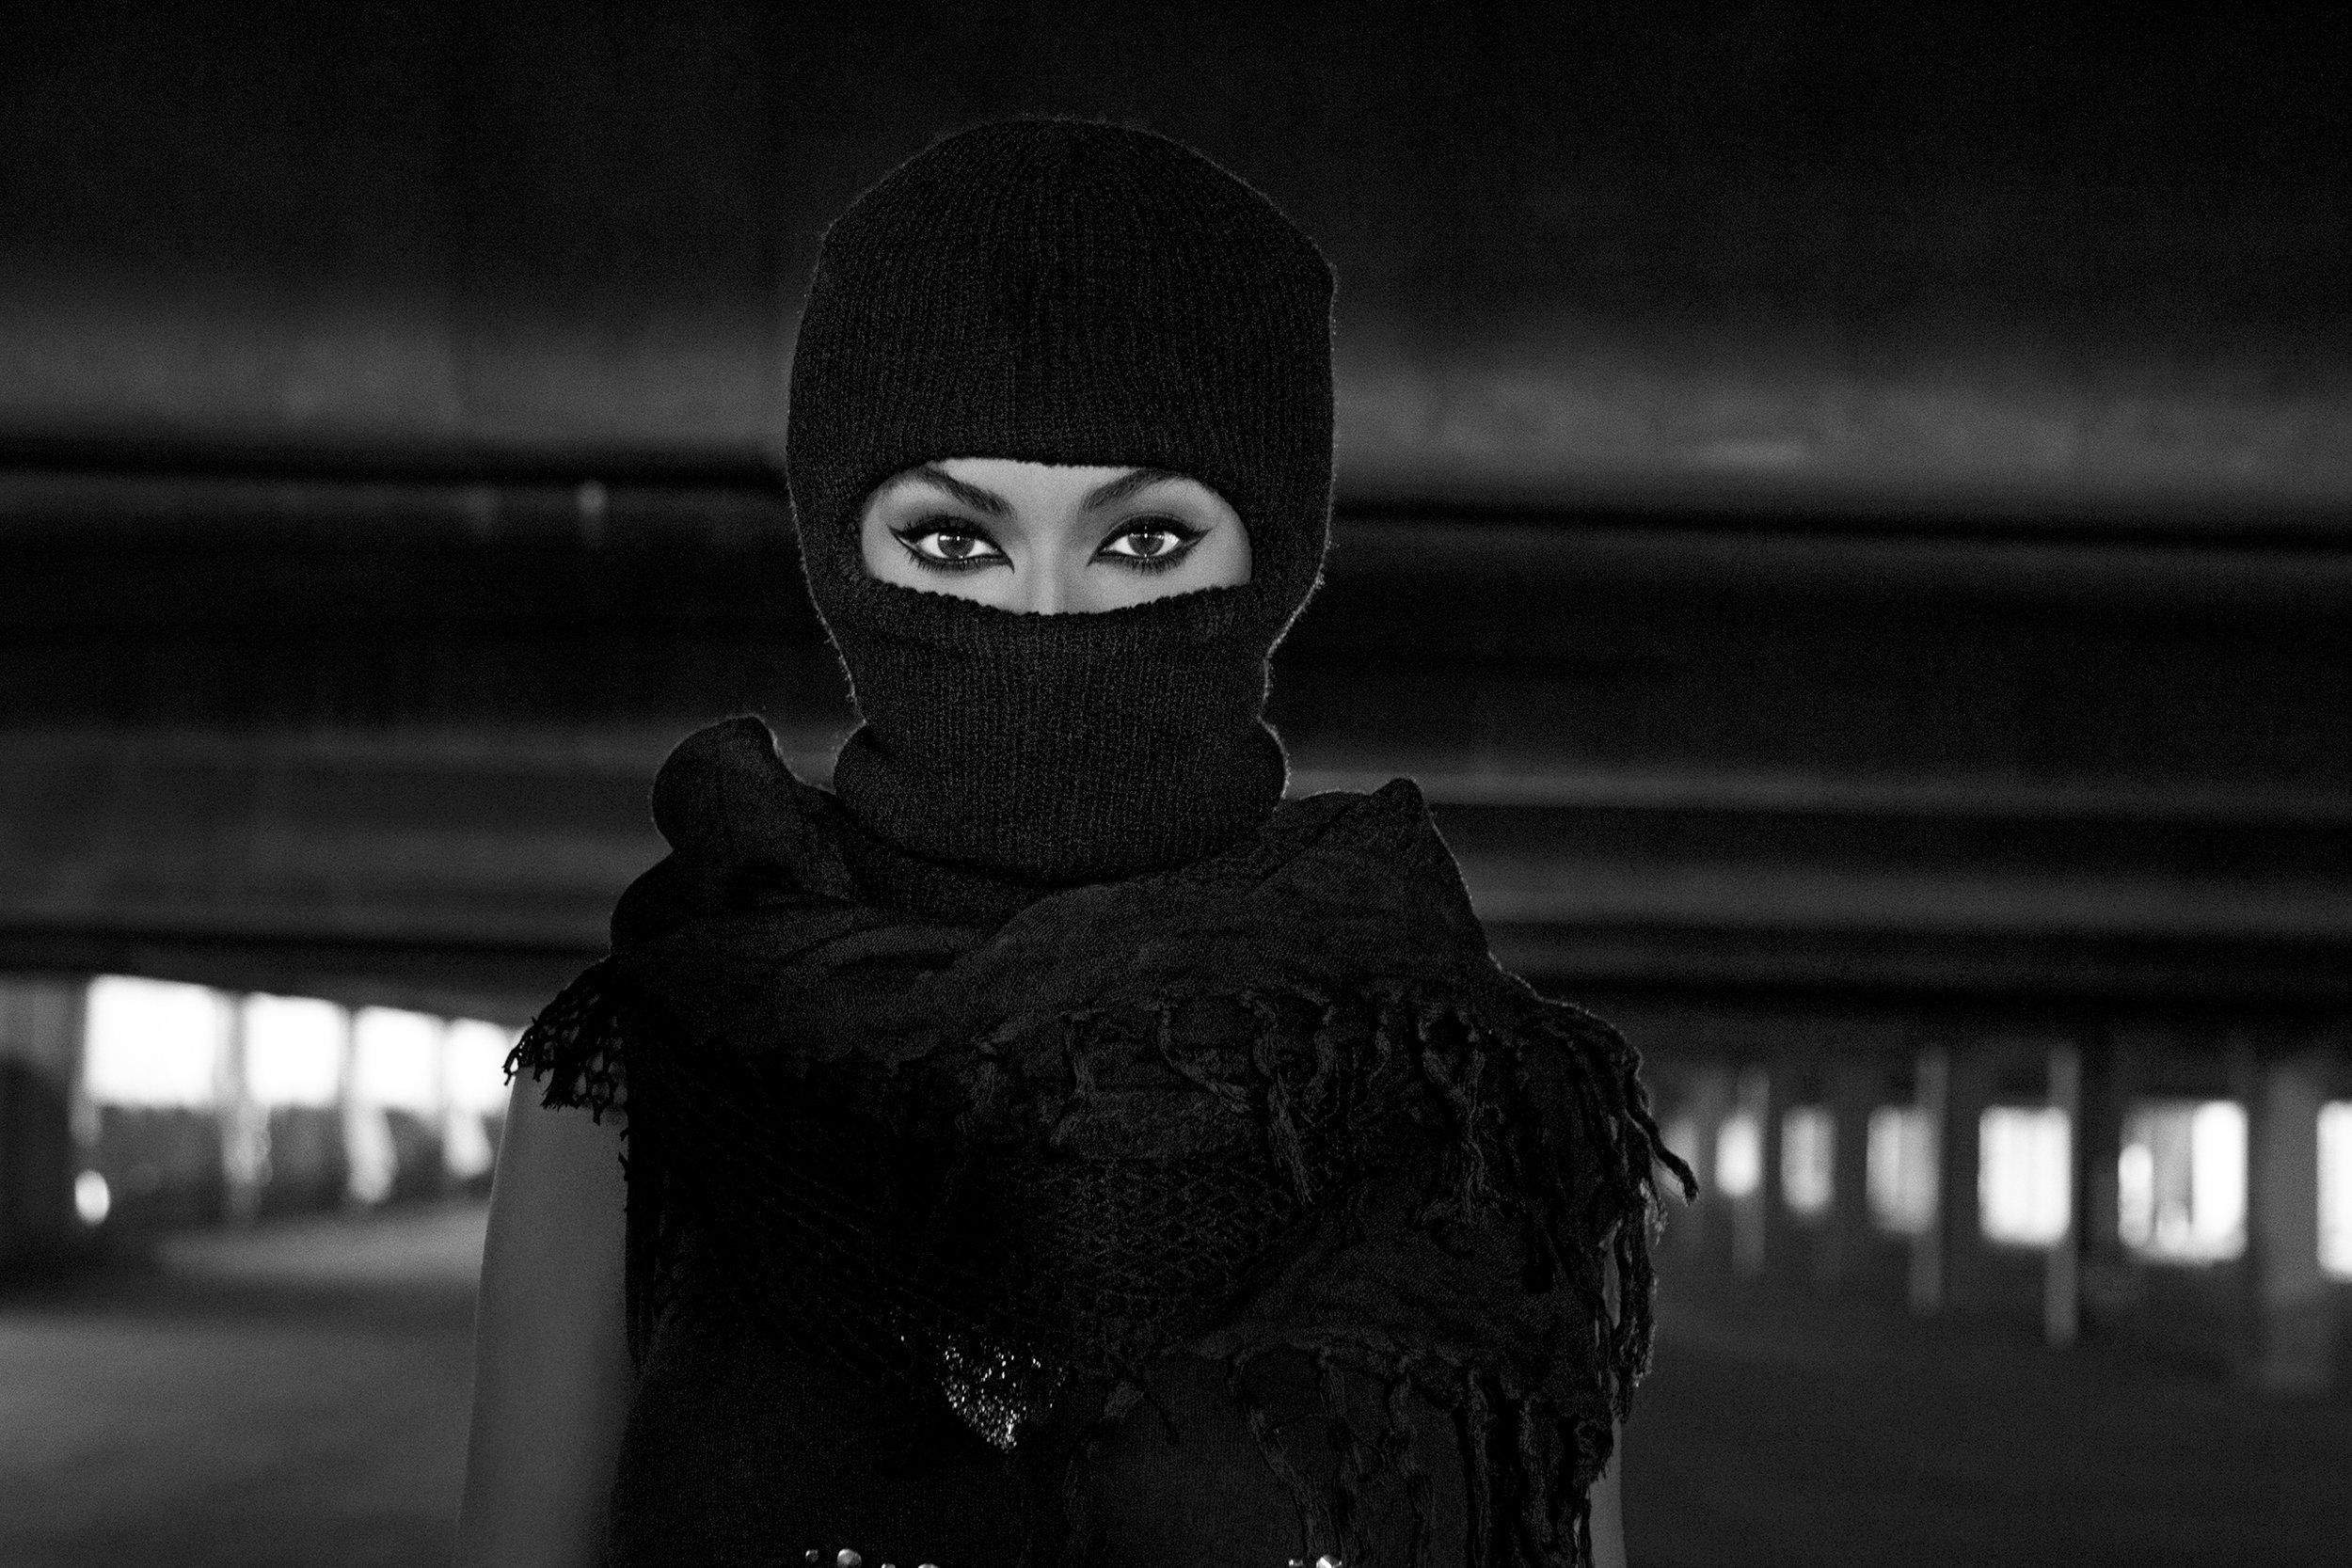 P_Beyonce_Book_54_AB3U2155-v2_bw.jpg